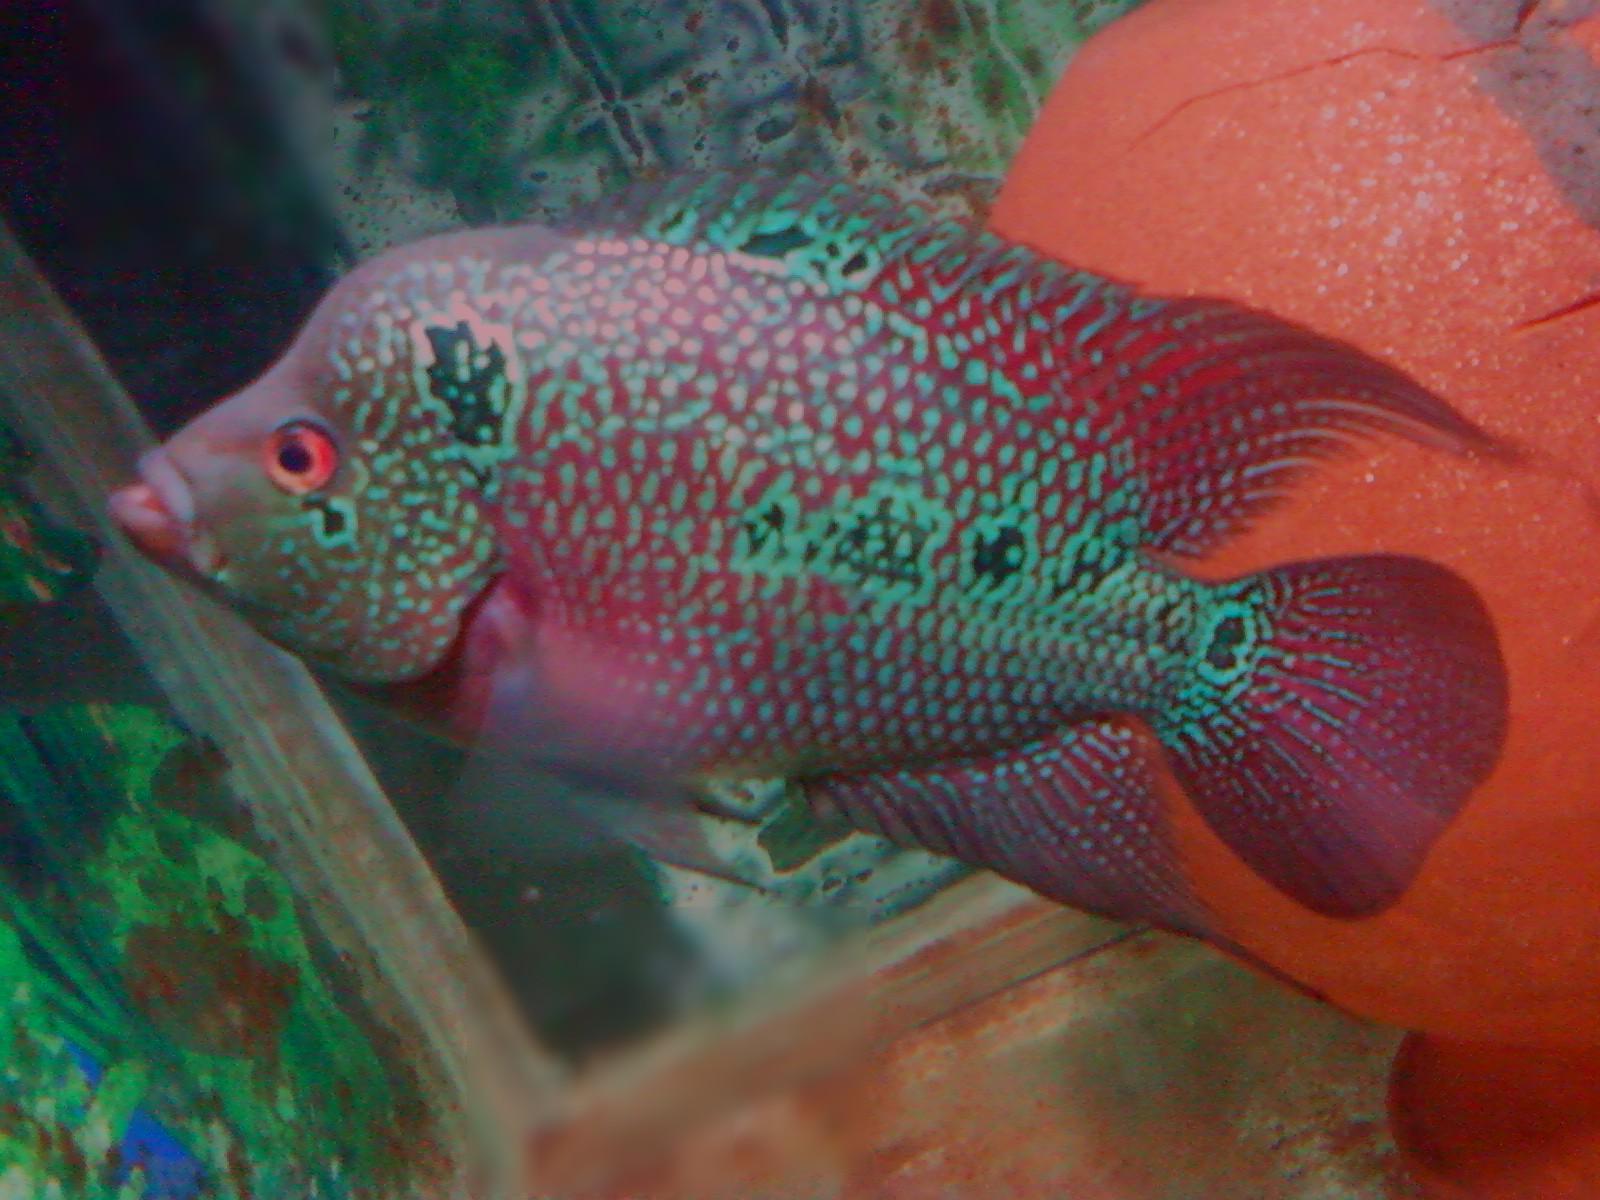 cichlids My flowerhorn under Aquarium flurosent lite